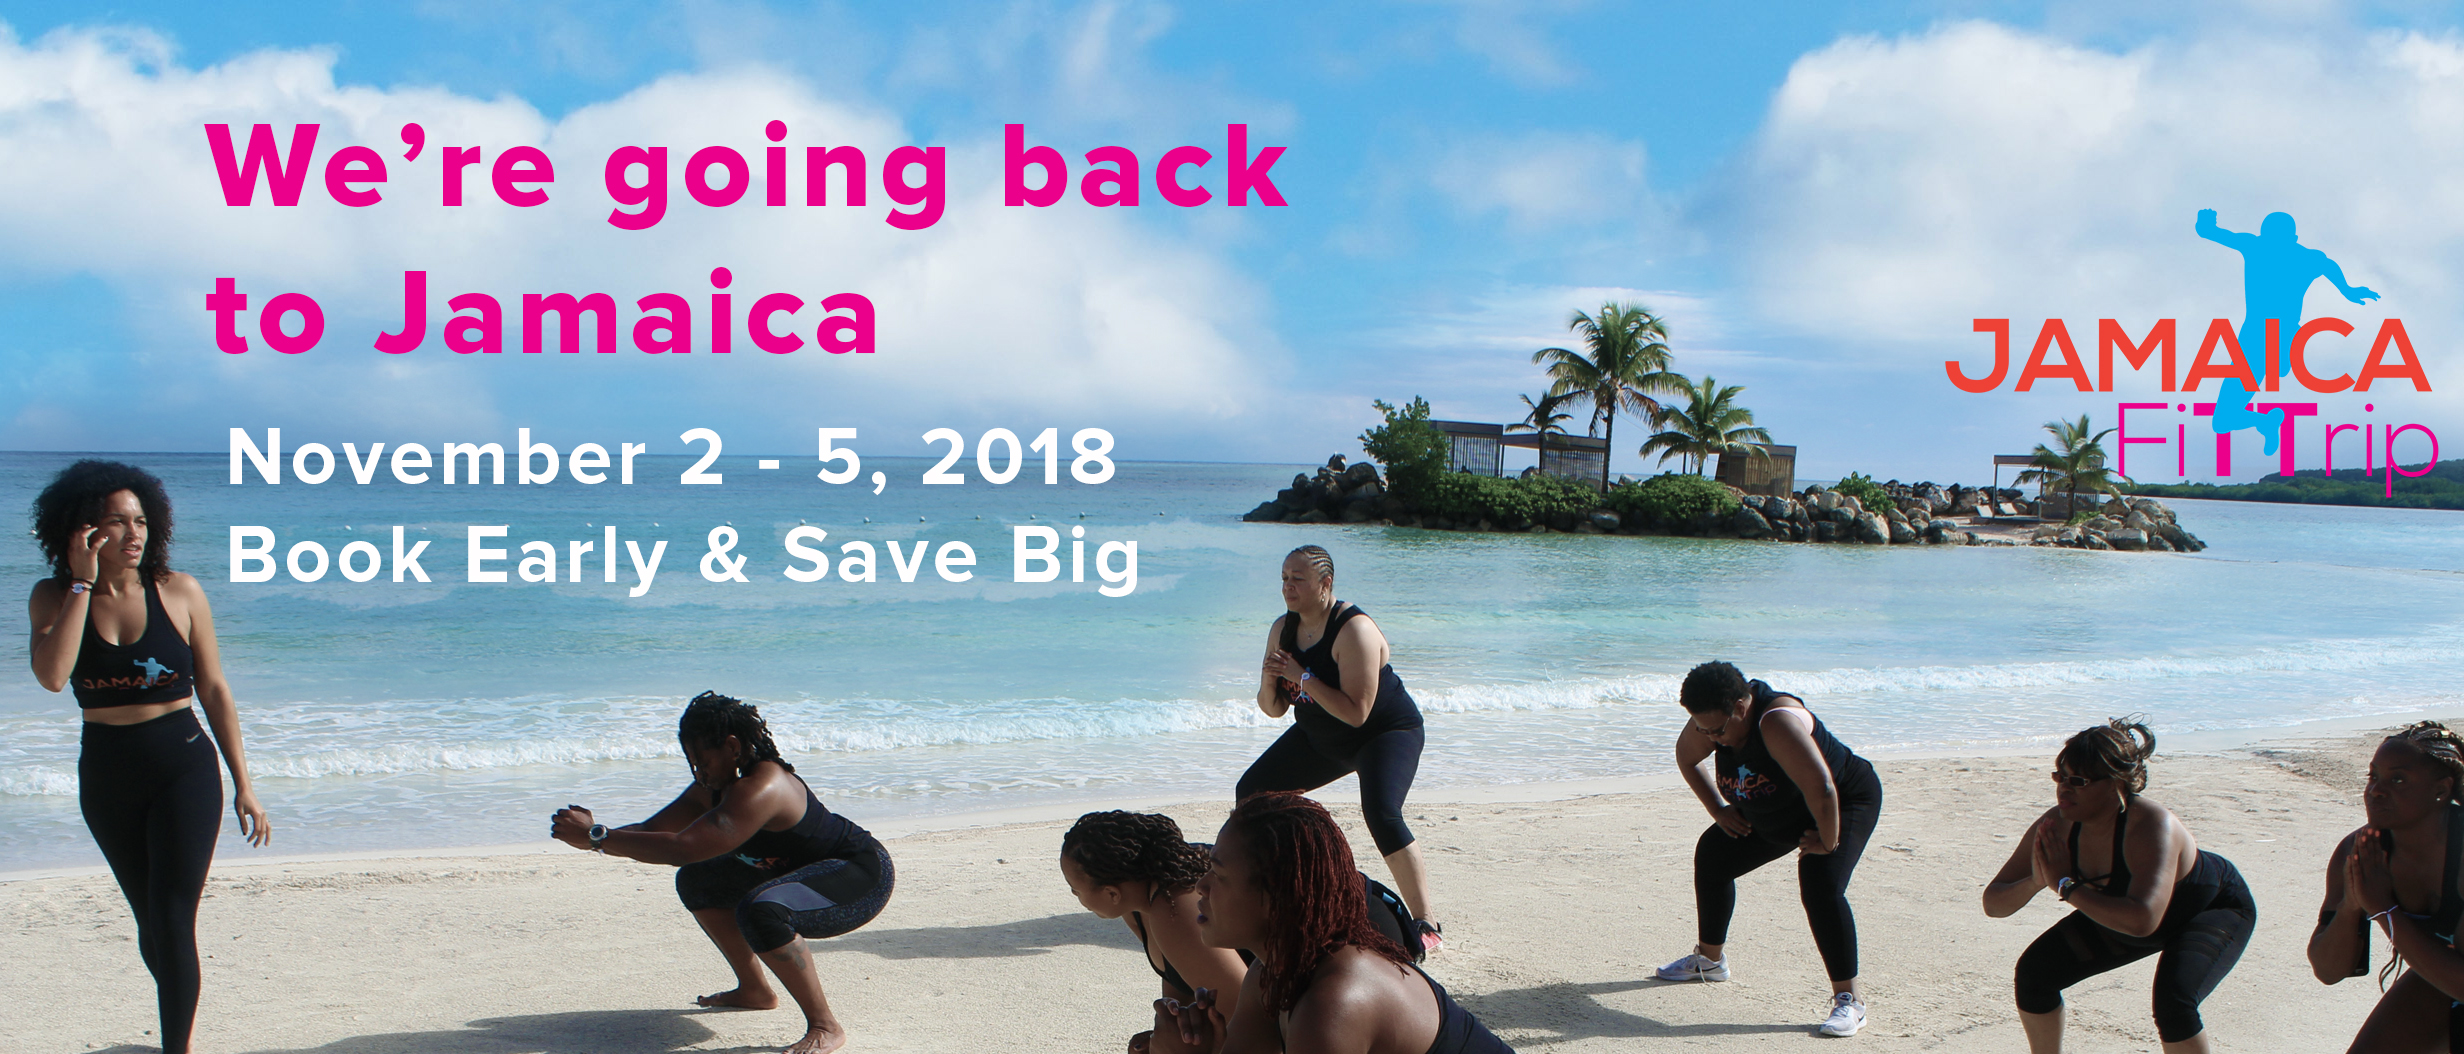 Jamaica Fit Trip 2018